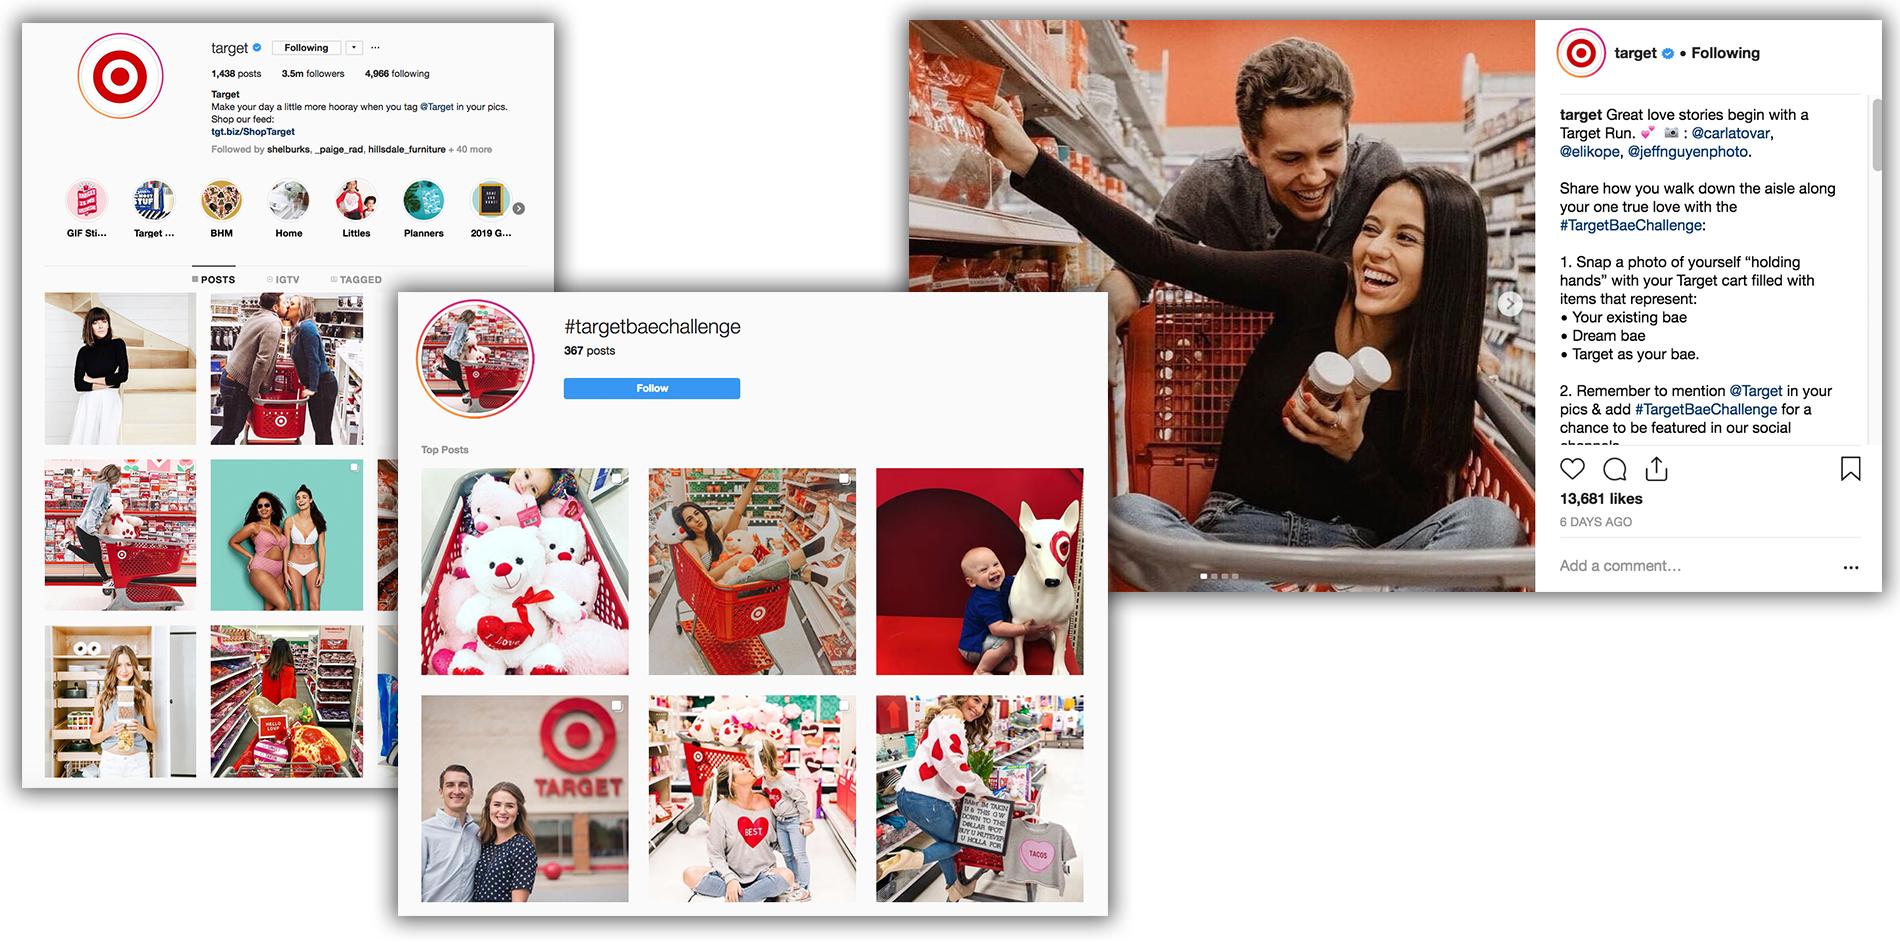 target-bae-challenge-collage